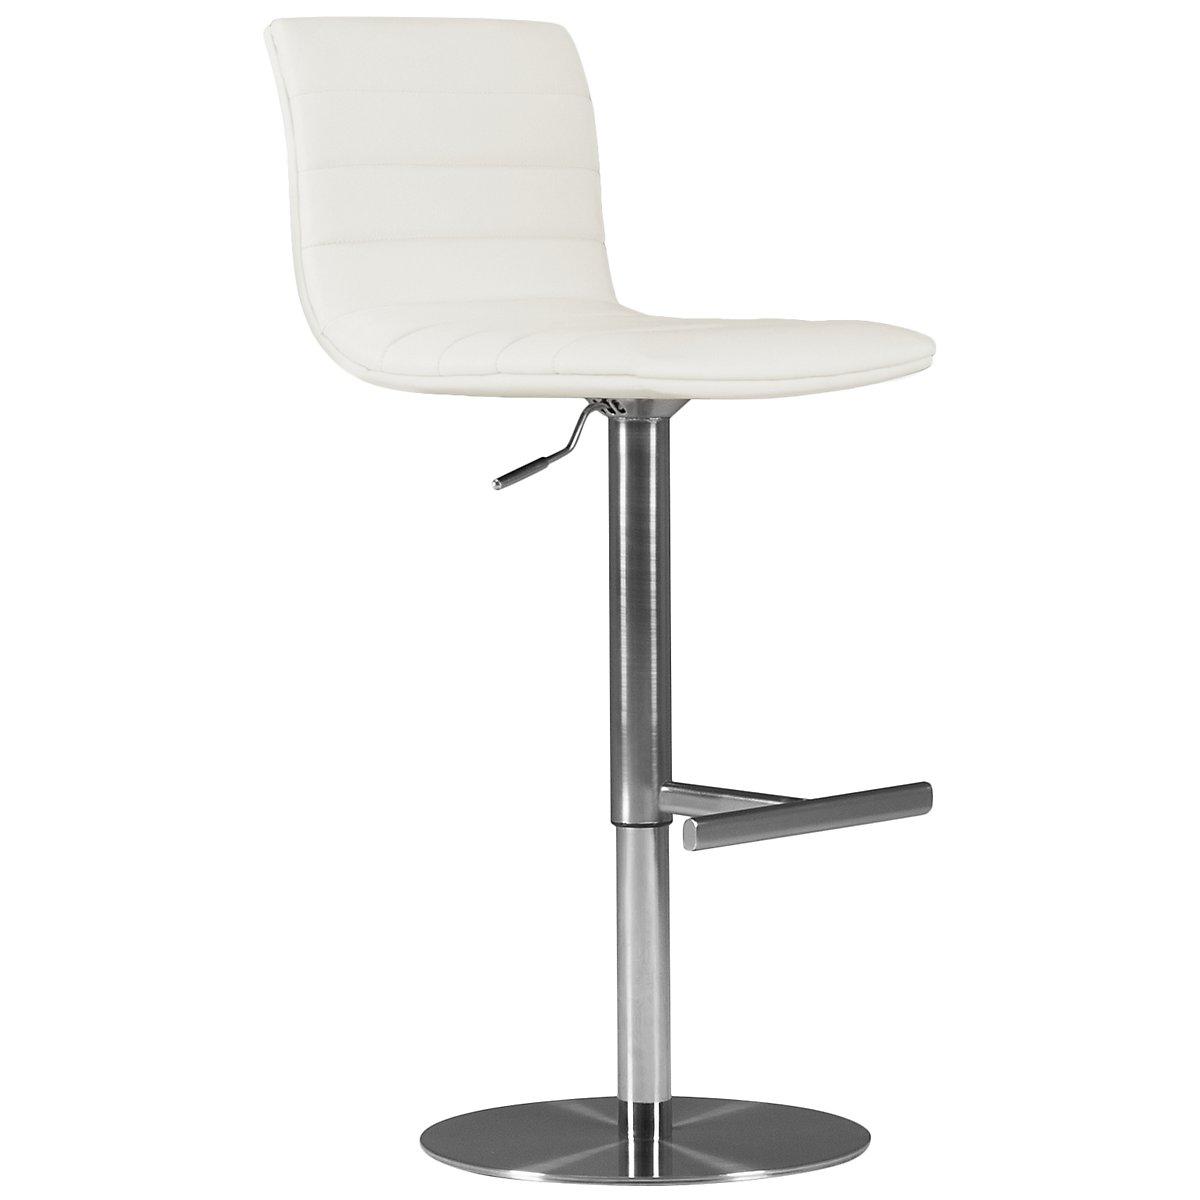 Ellis White Upholstered Uph Adjustable Stool